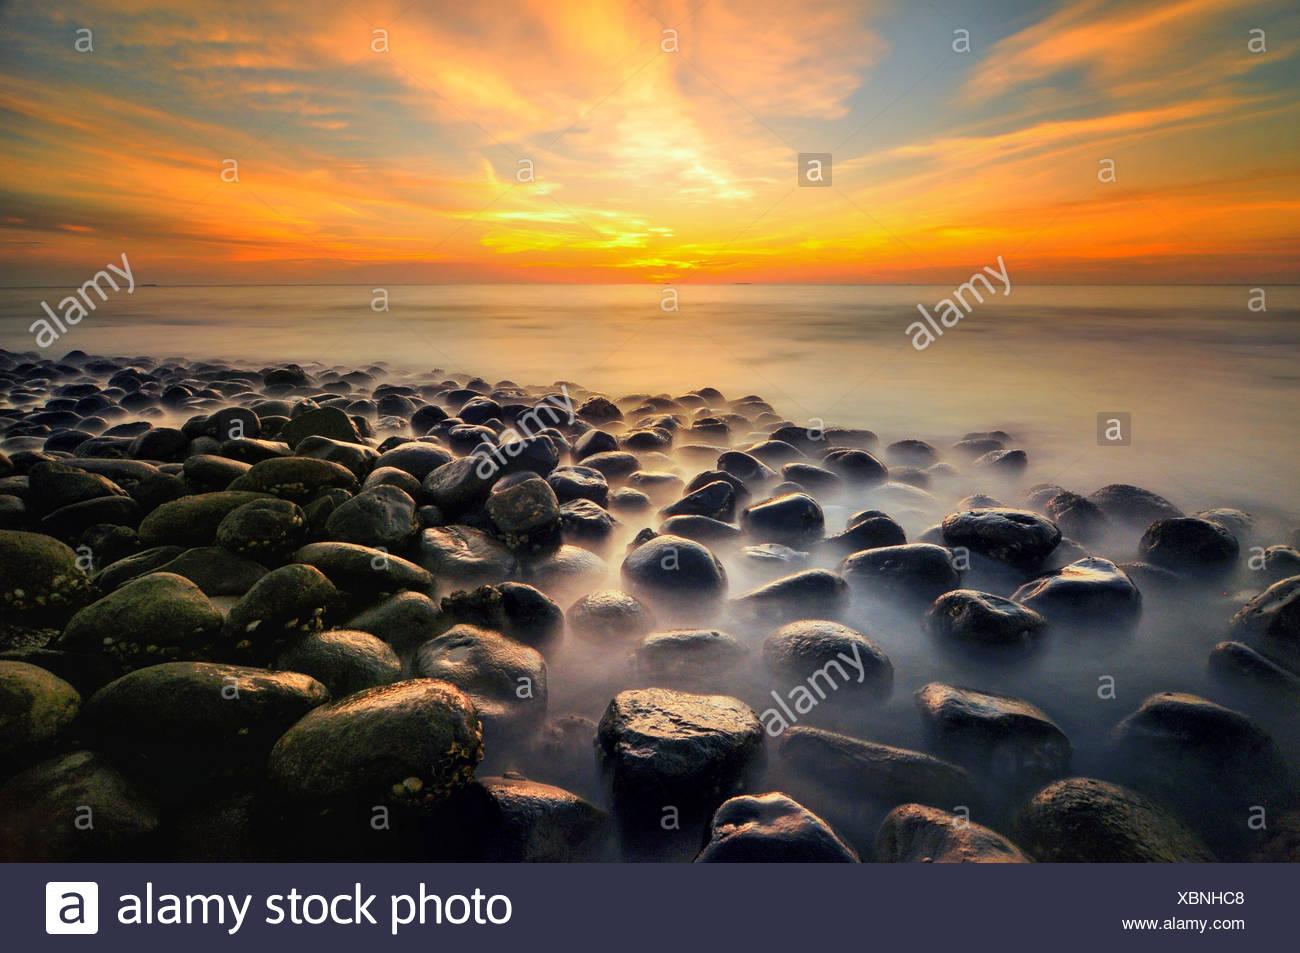 Malaysia, Pantai, tramonto al mare Immagini Stock